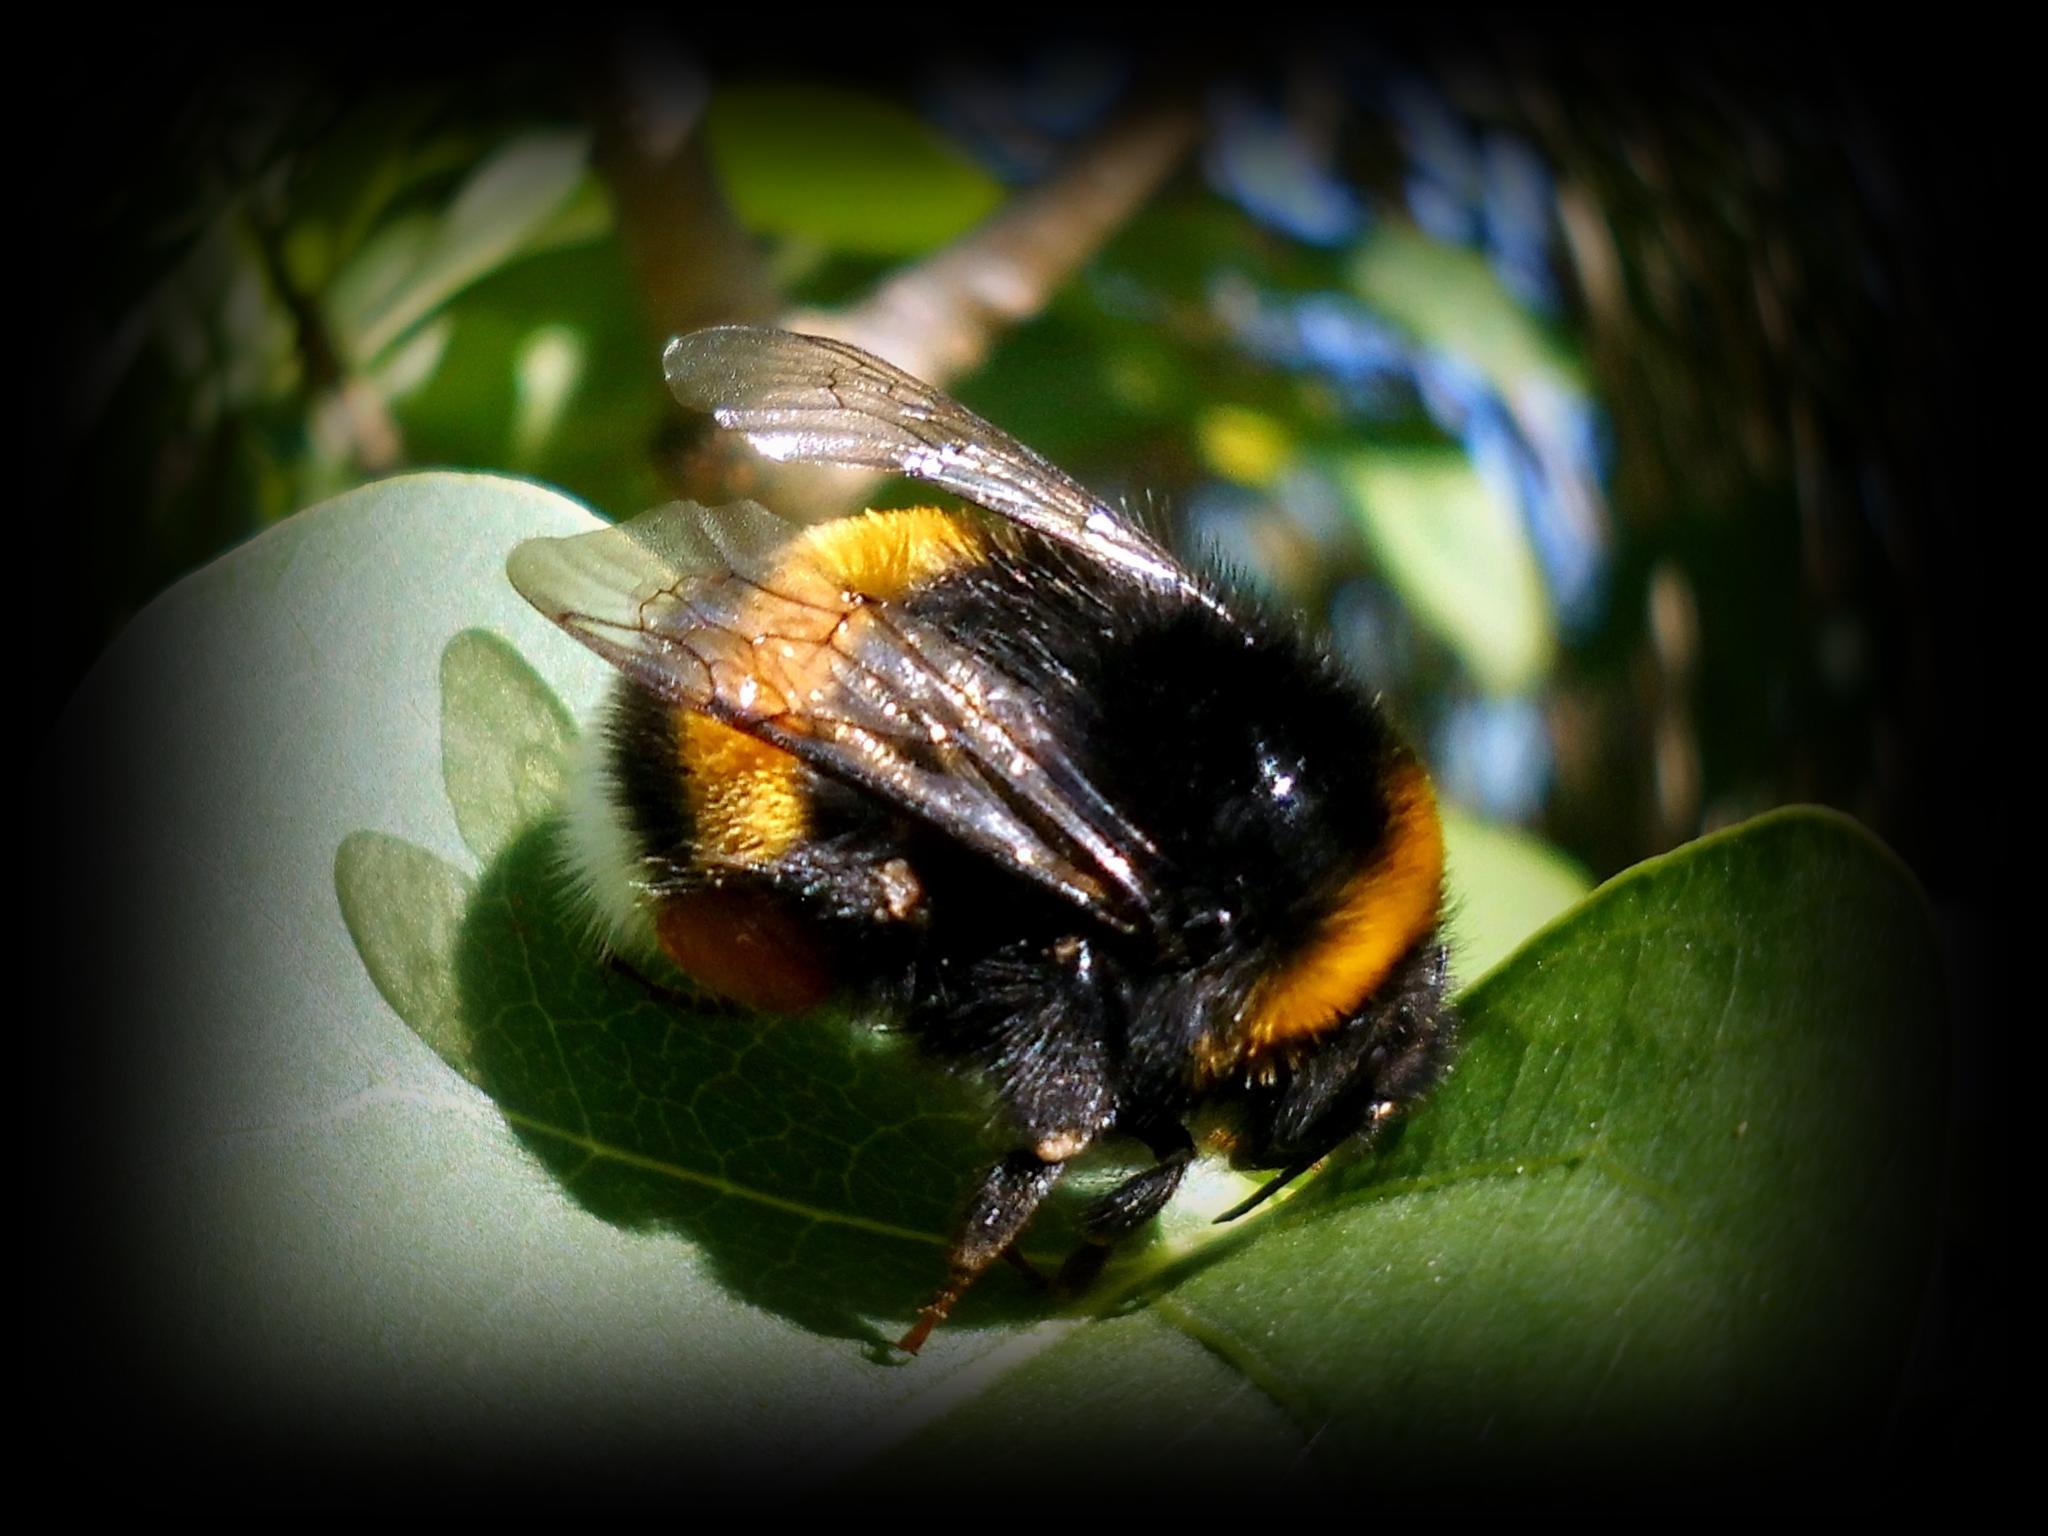 bumblebee by reinhard.tenzler